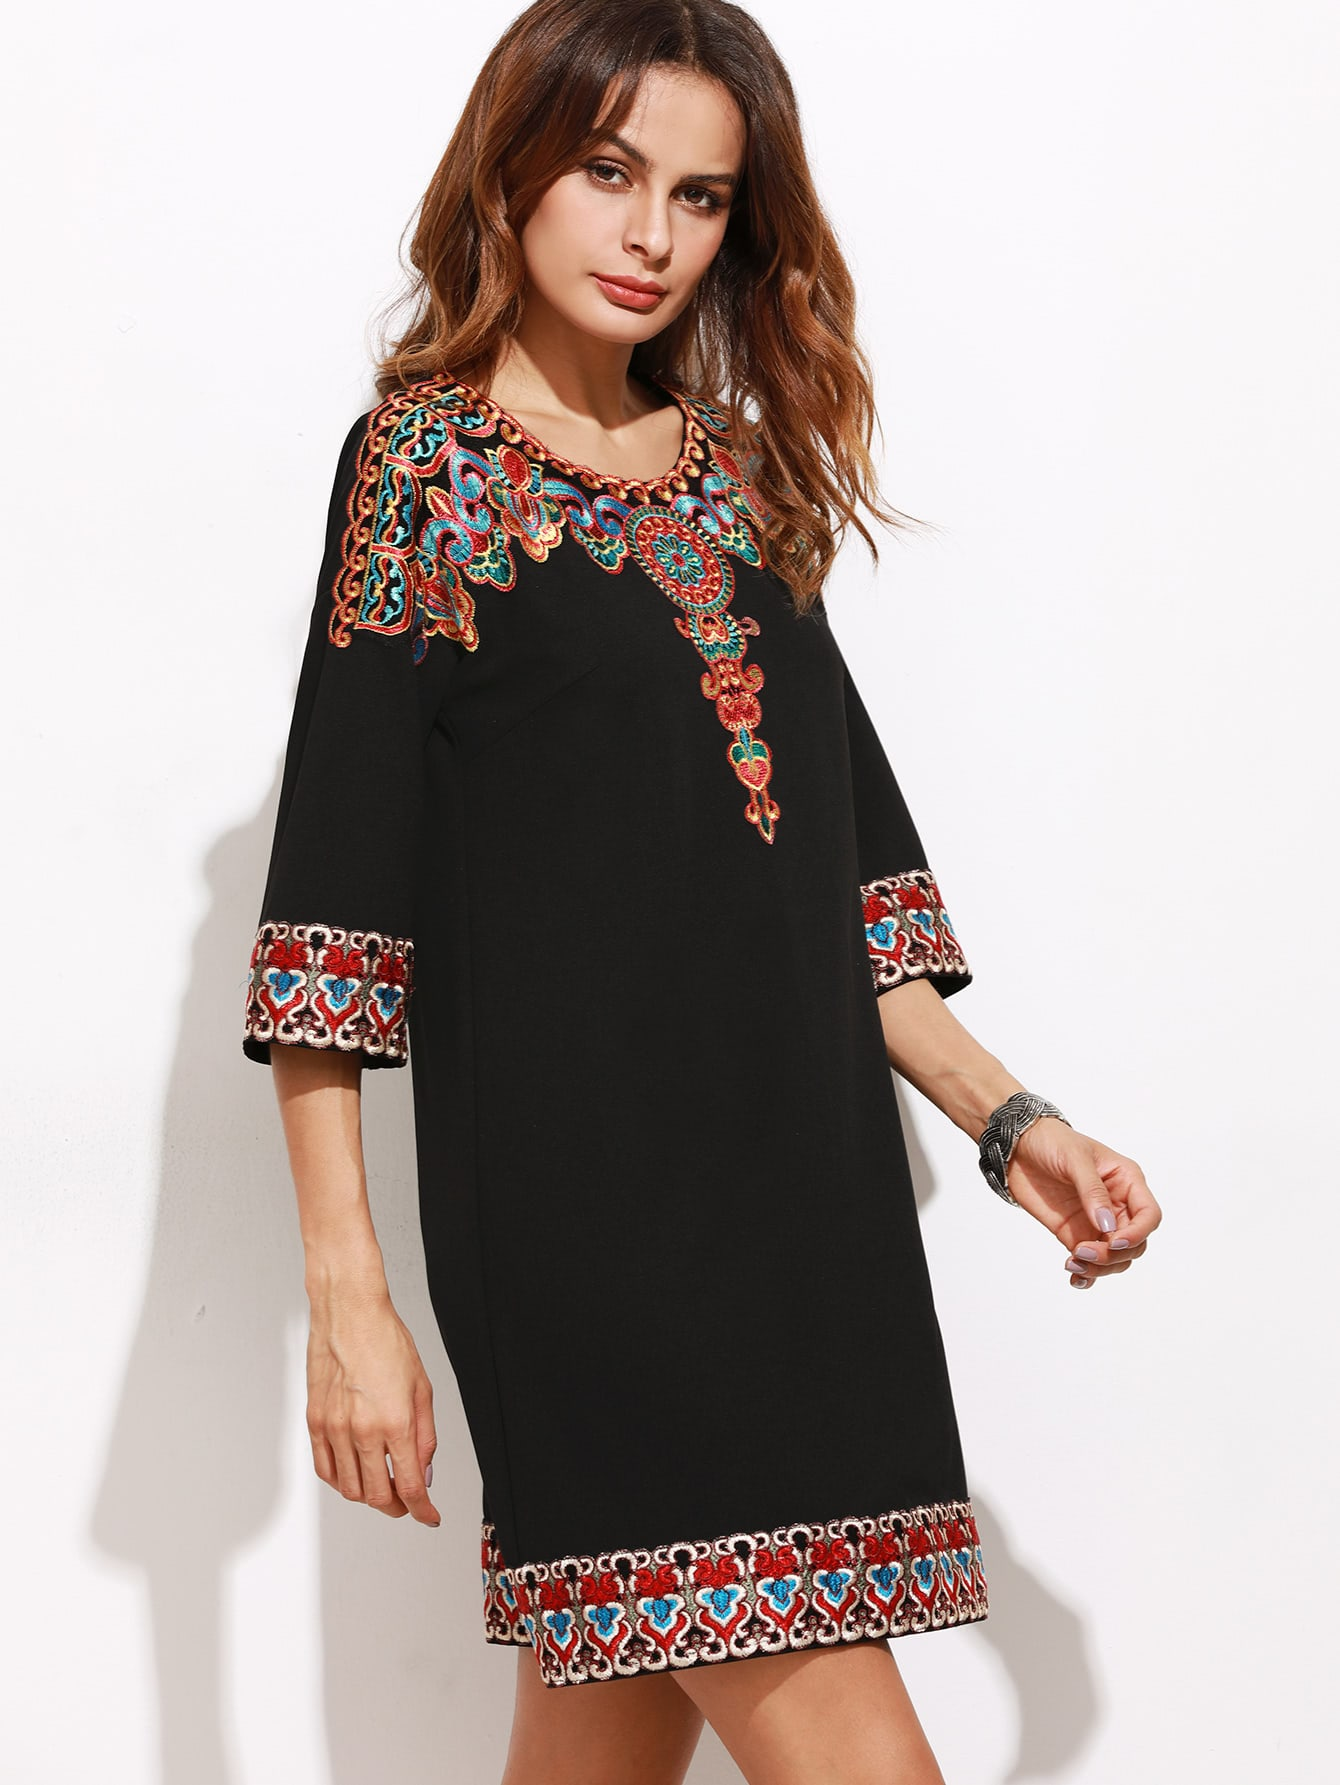 Black 3/4 Sleeve Embroidered Tunic DressBlack 3/4 Sleeve Embroidered Tunic Dress<br><br>color: Black<br>size: XS